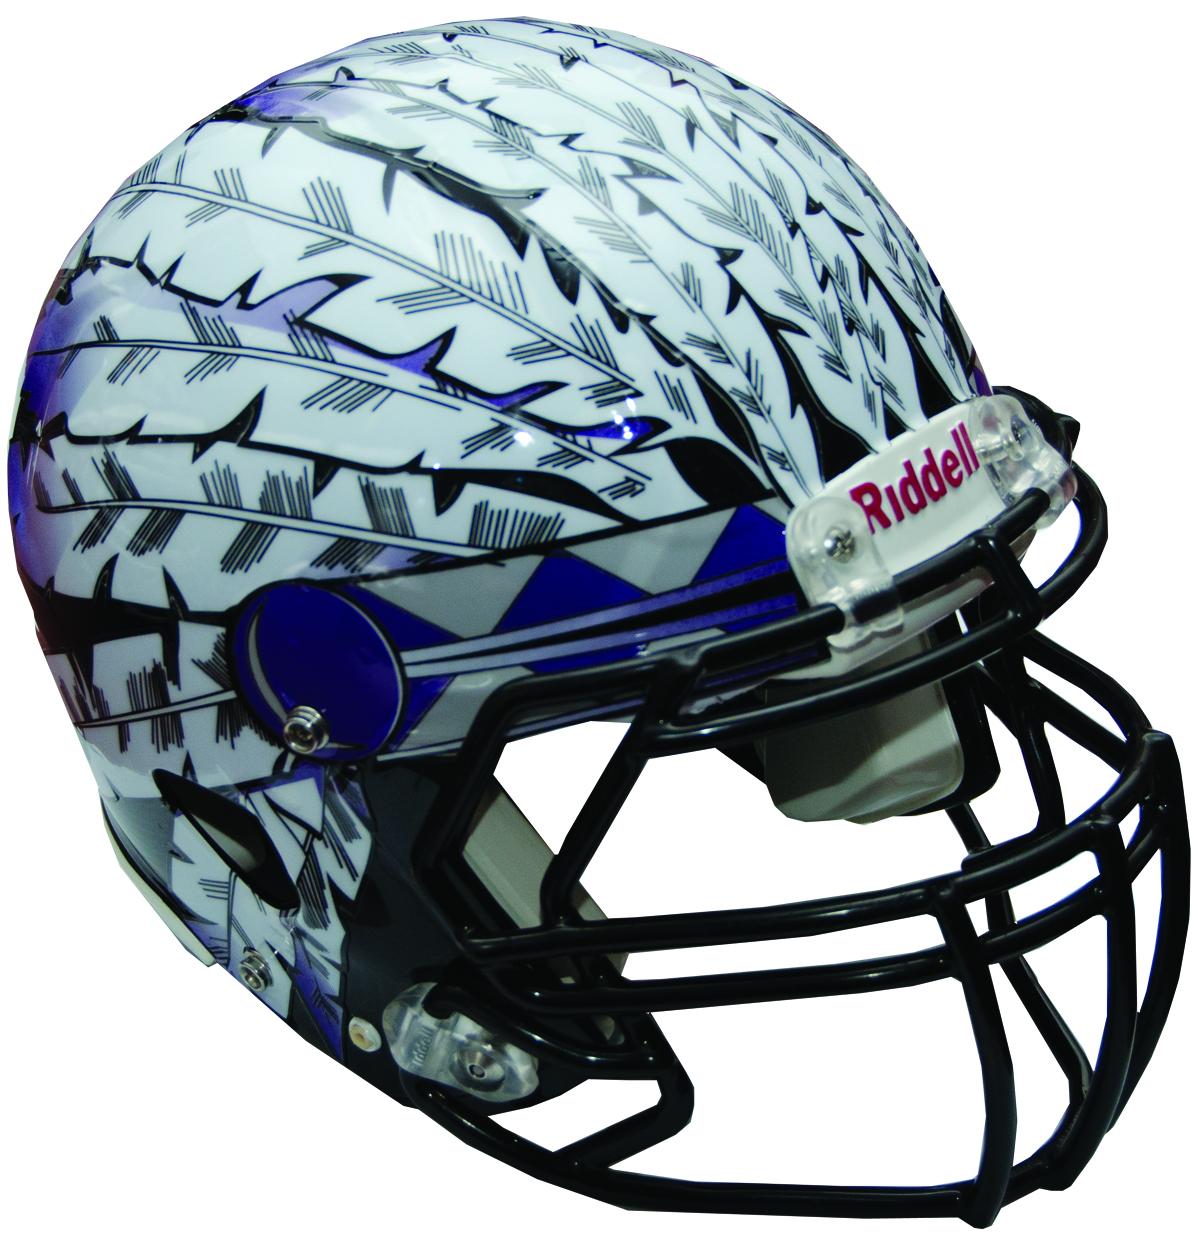 1200x1243 Perfect Football Helmet Logo Maker 91 For Free Logo Design